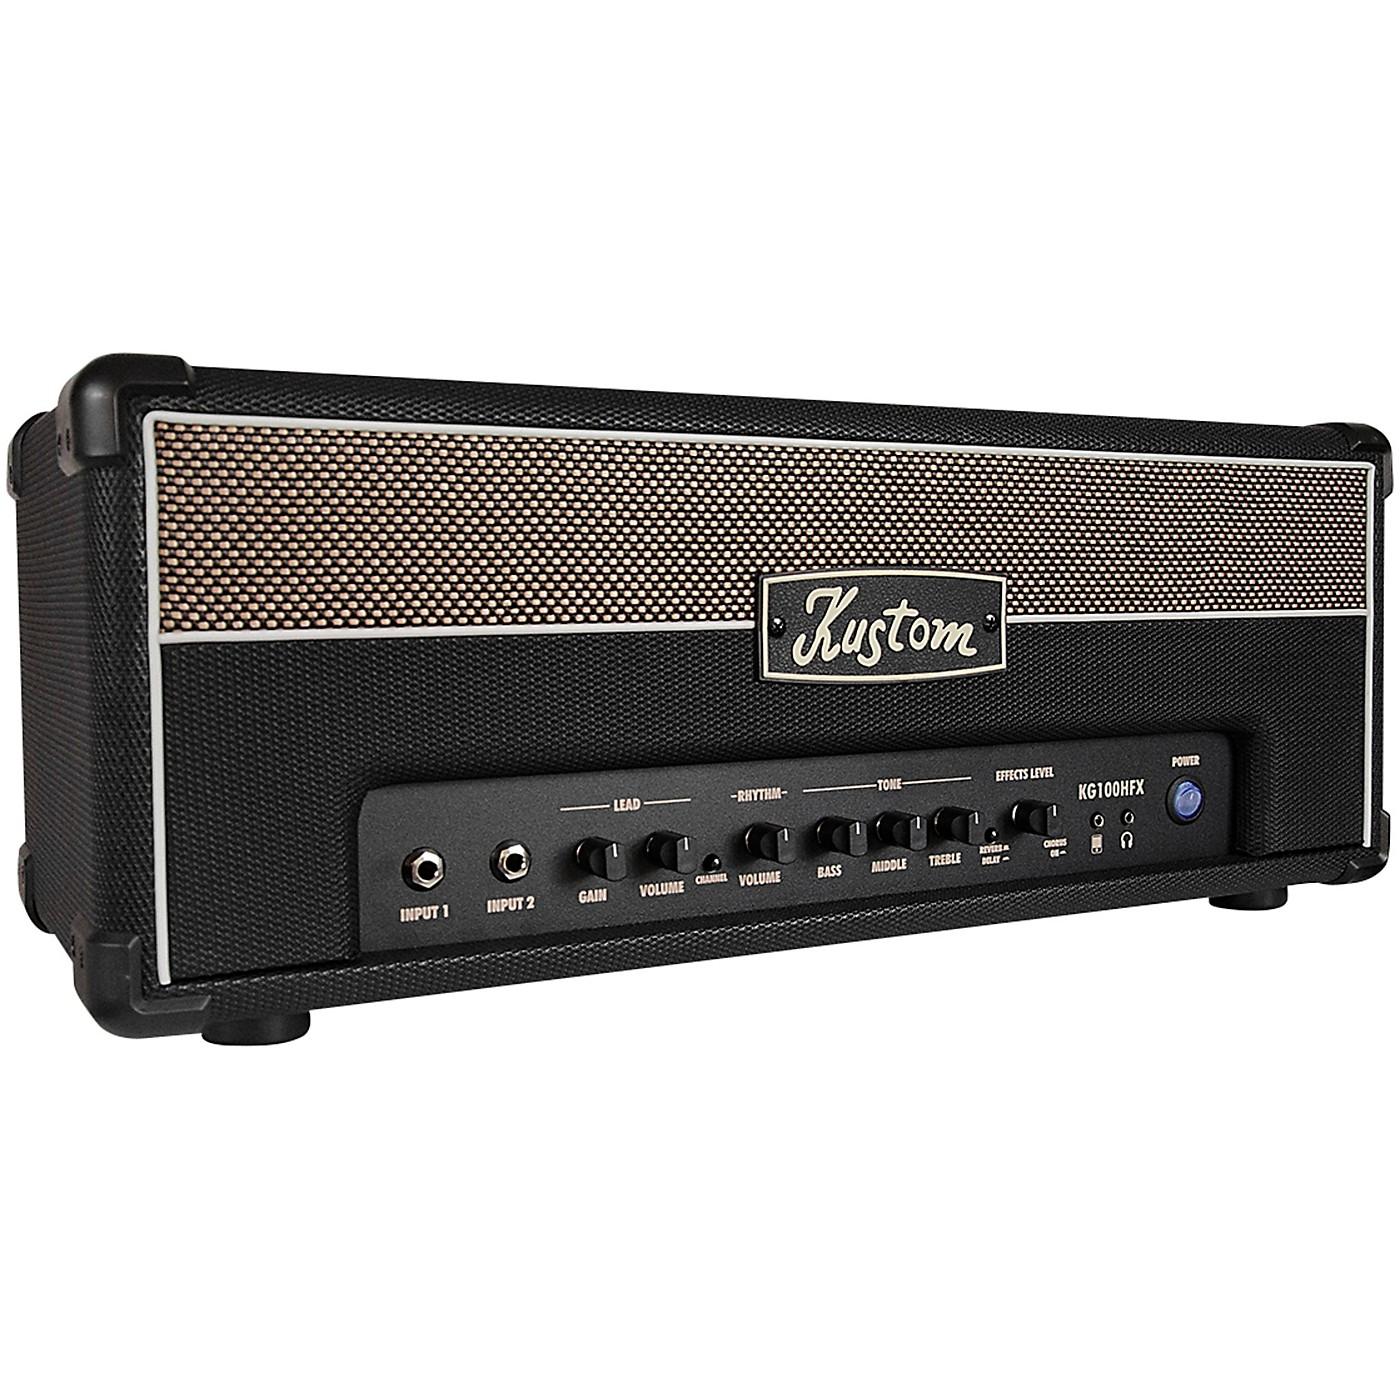 Kustom KG100HFX 100W Guitar Amp Head thumbnail